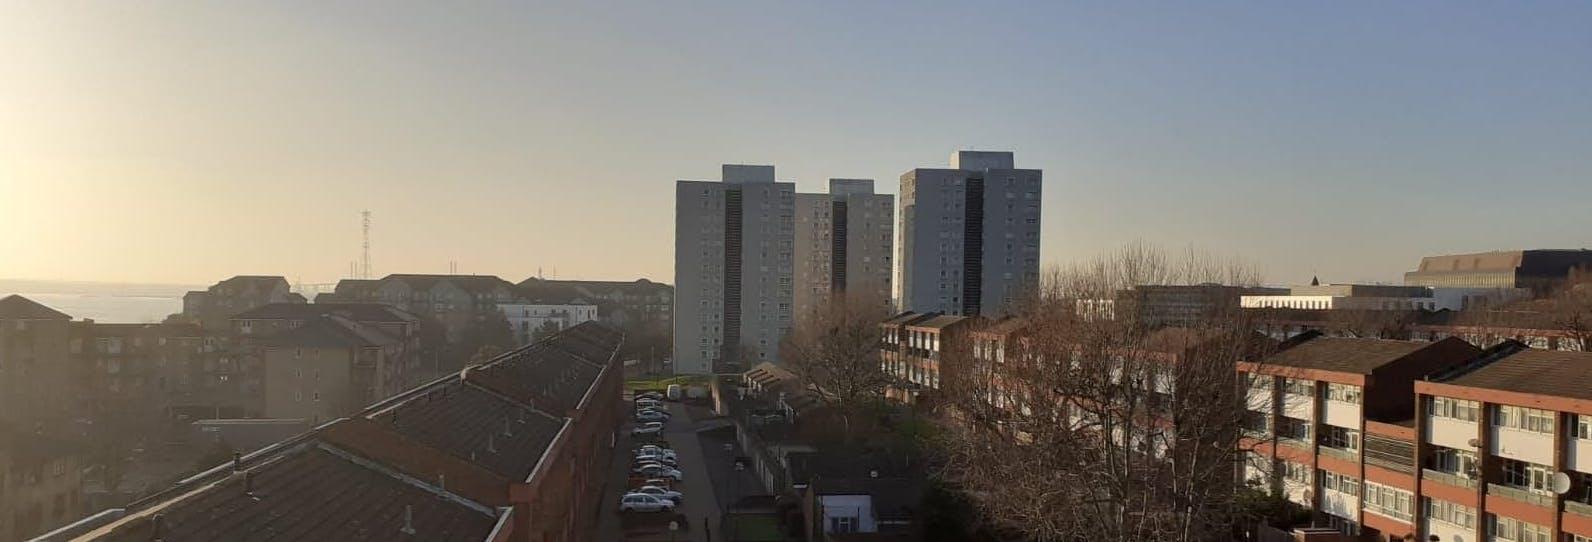 High Rise Tower Blocks in Grays, Essex